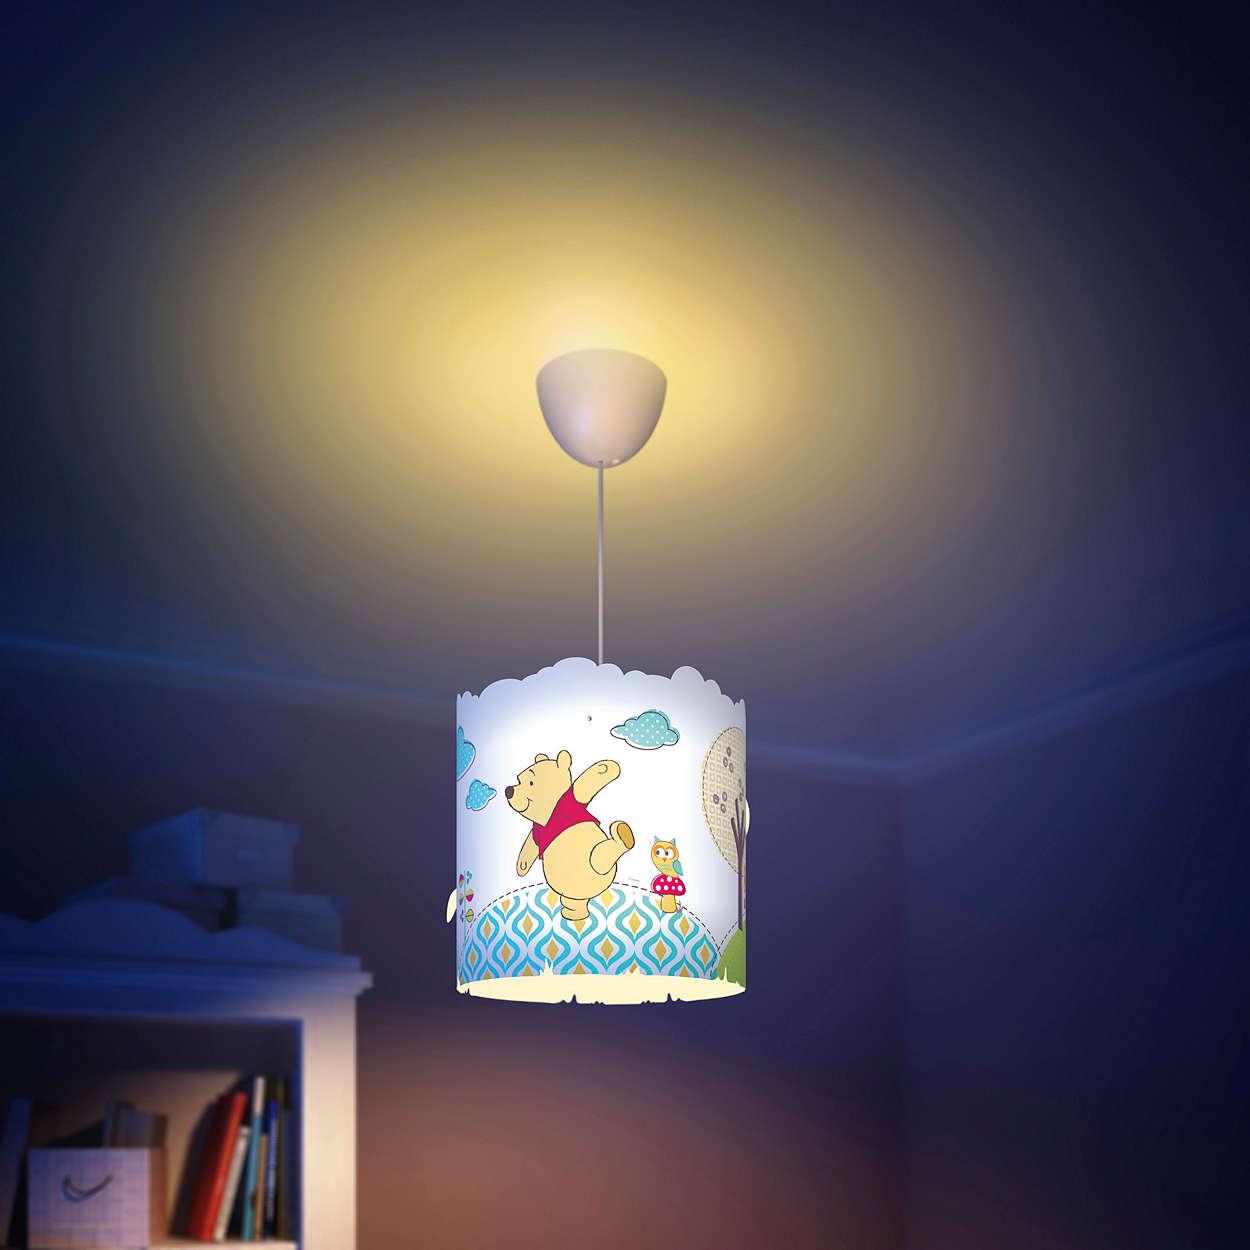 Suspension light 717513426 disney switch on imagination mozeypictures Images